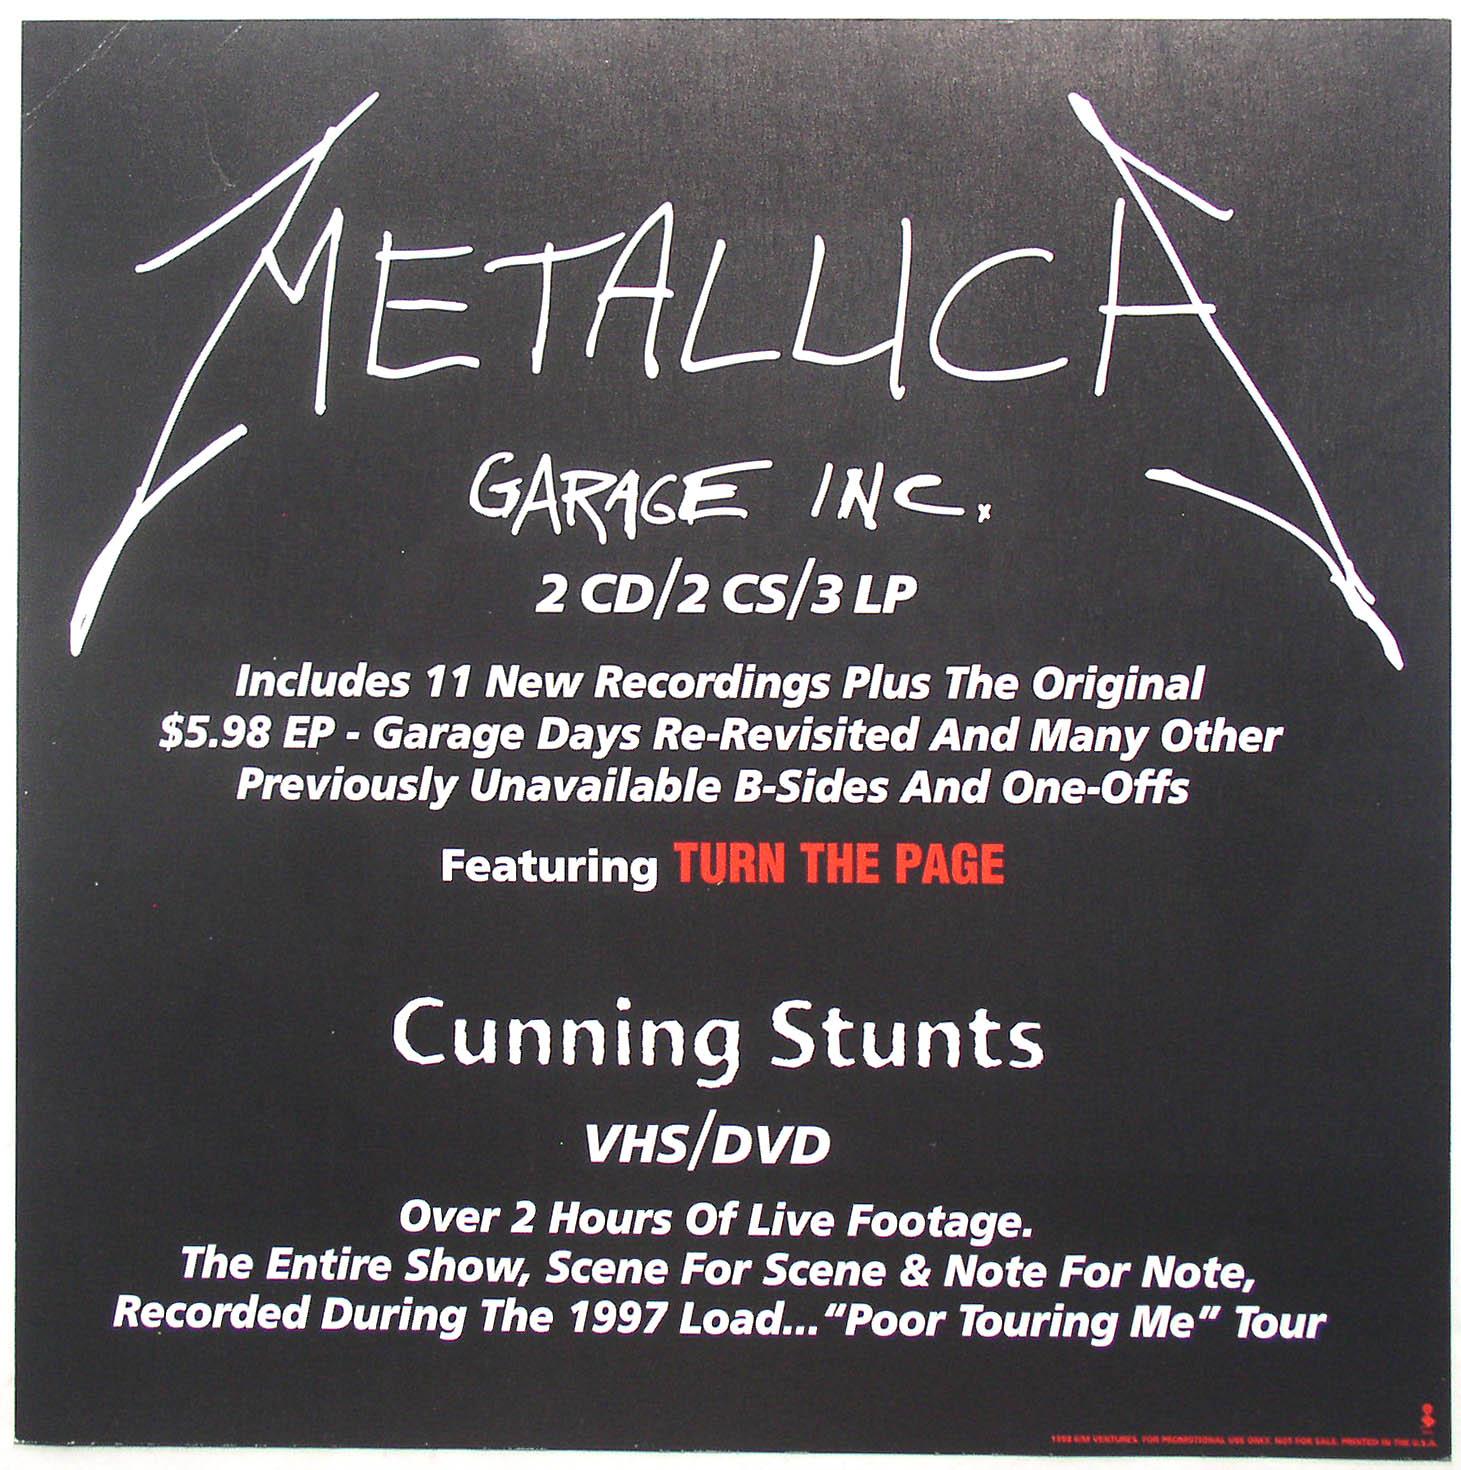 Metallica / Garage Inc - Thingery Previews Postviews